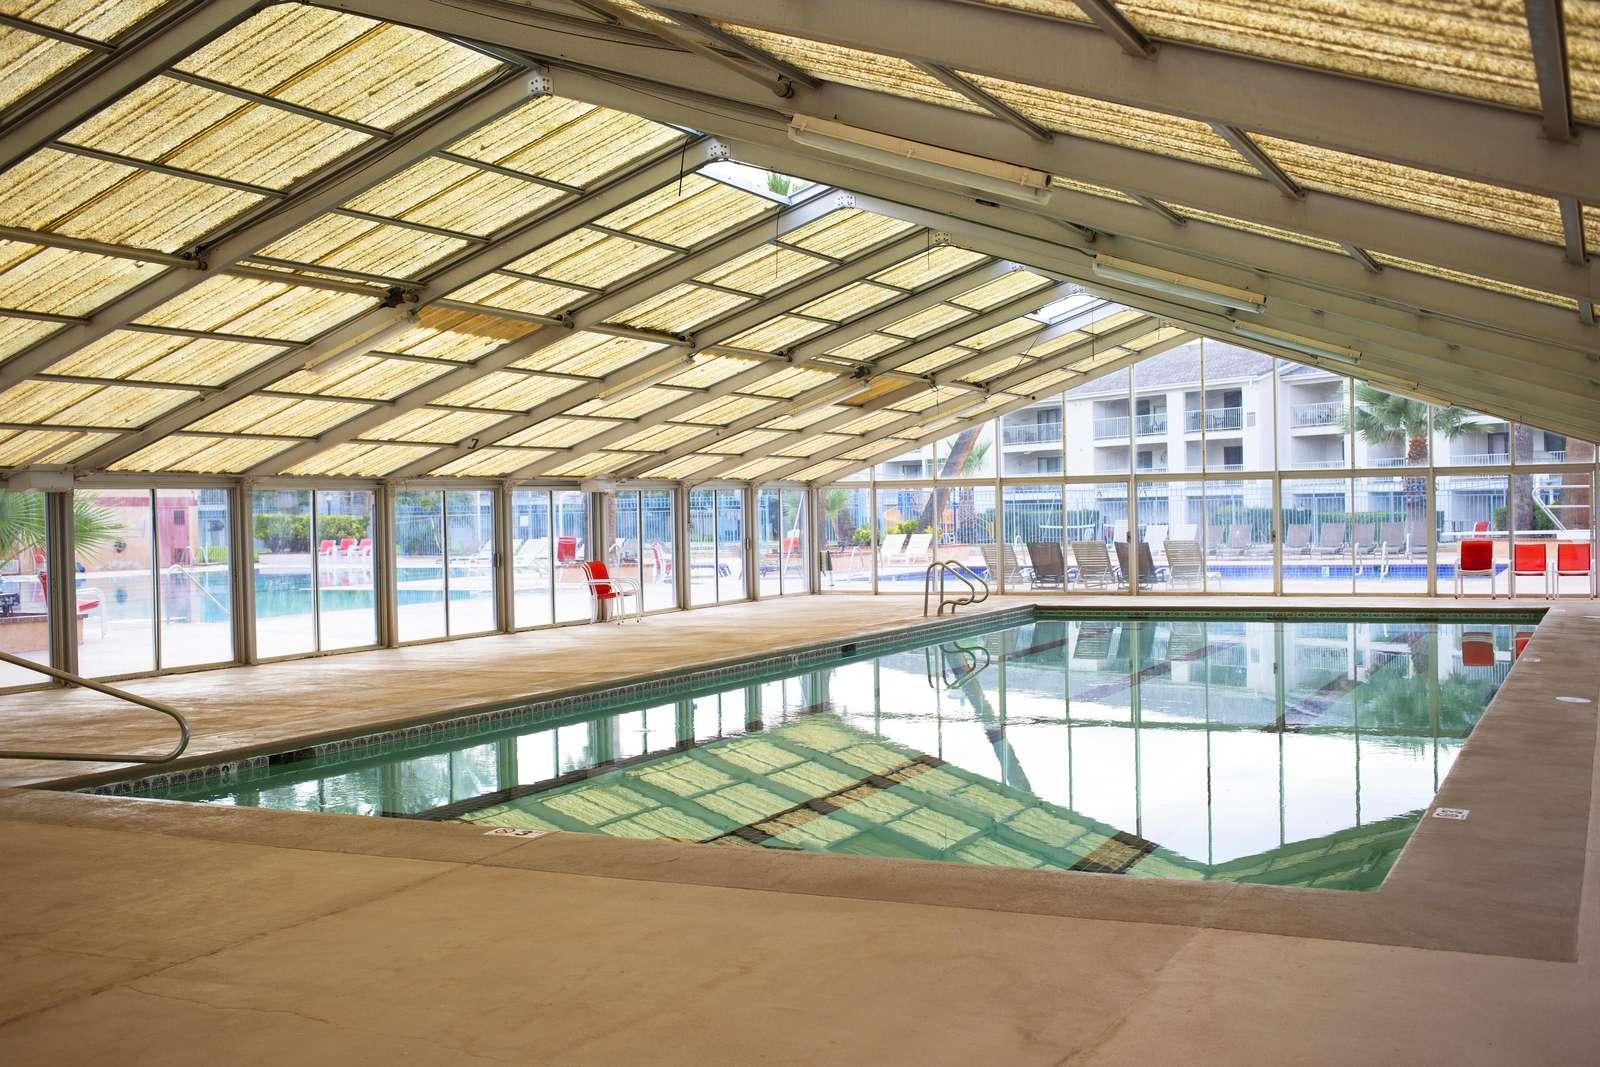 Indoor Pool - Heated (Year Round)